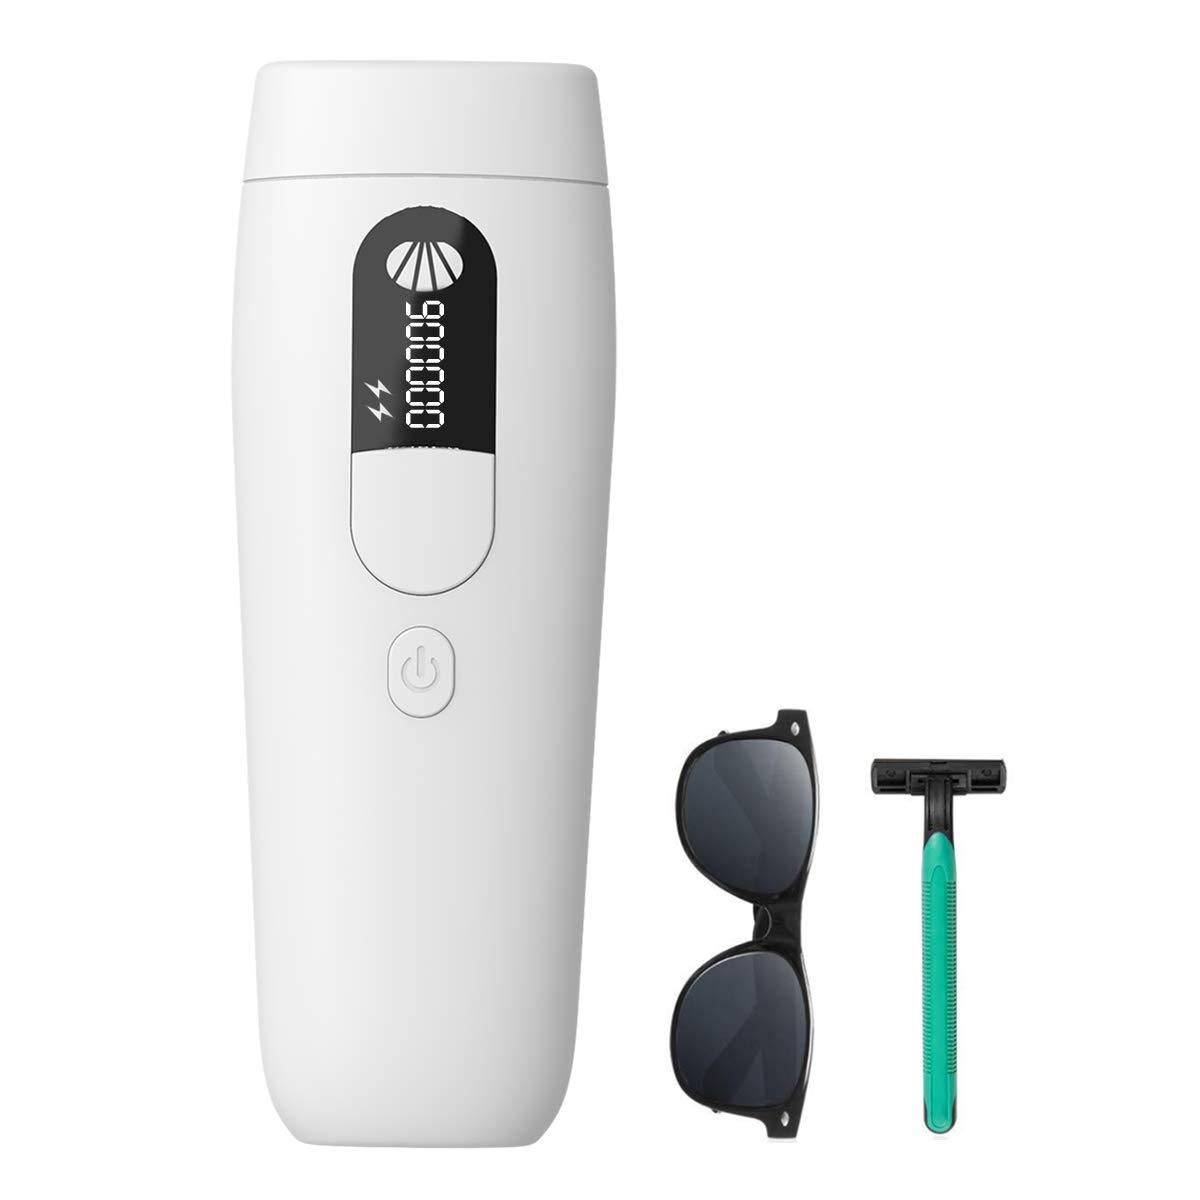 Amazon Com Ipl Permanent Hair Removal For Women Men Lovcoyo